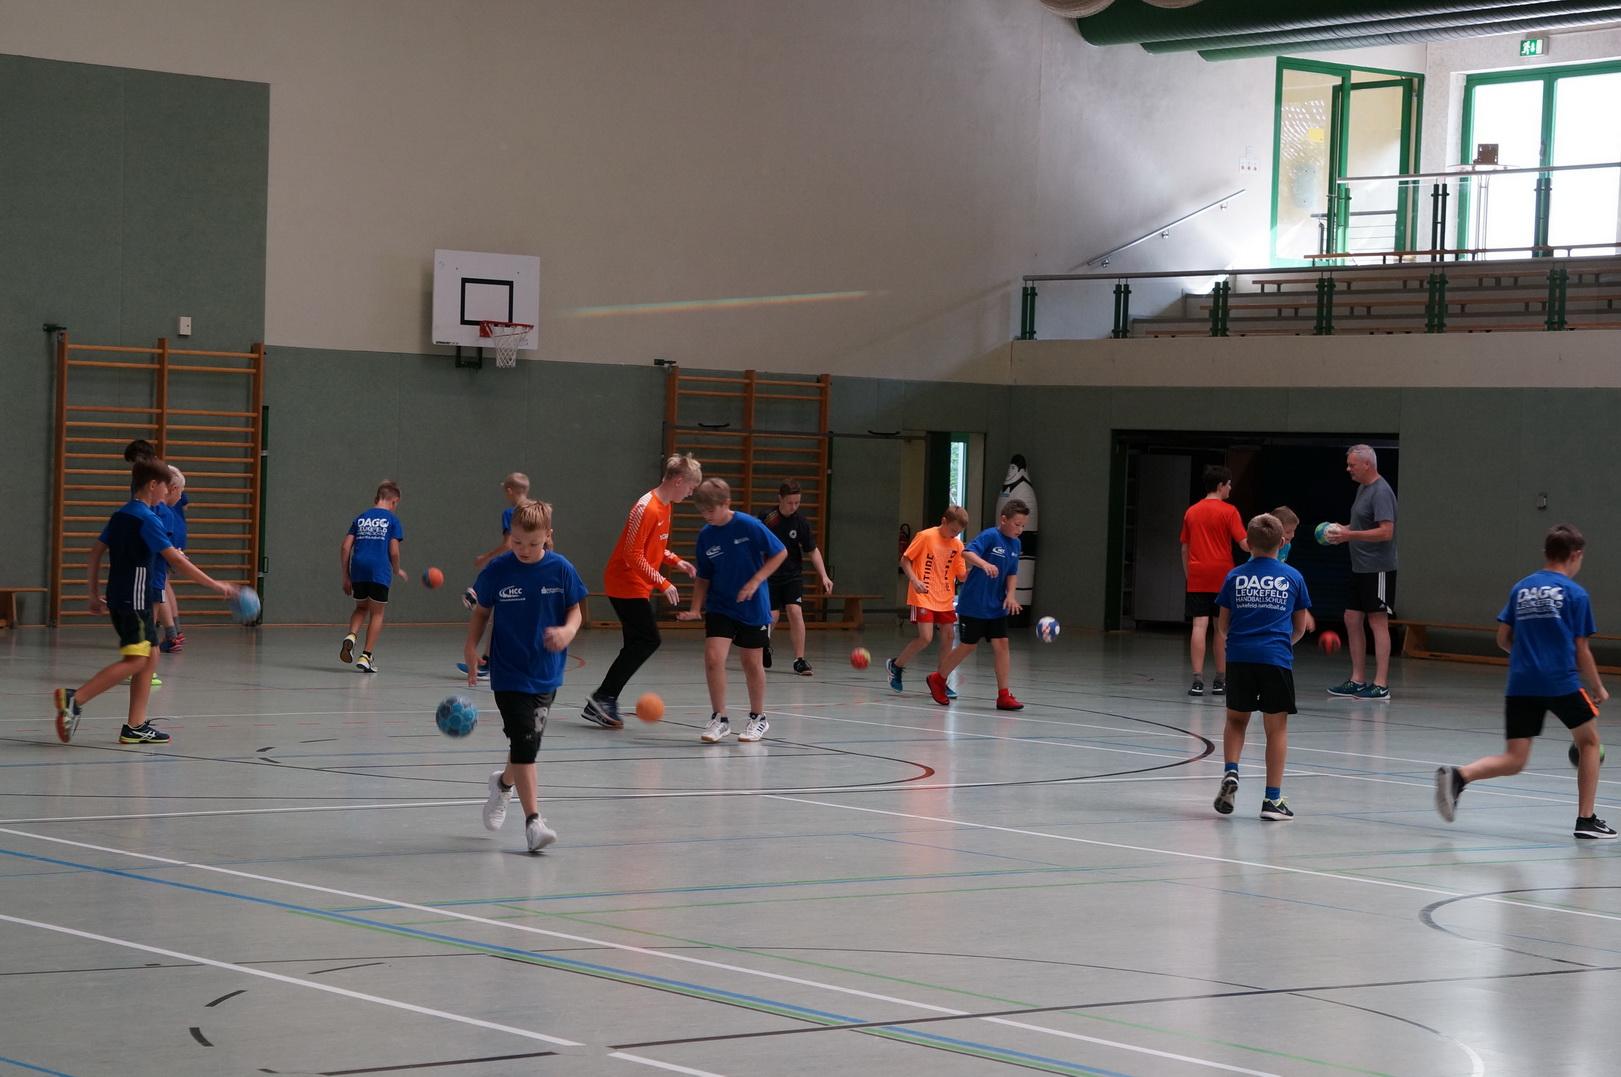 201808_Handballcamp_SDH_MG_147w